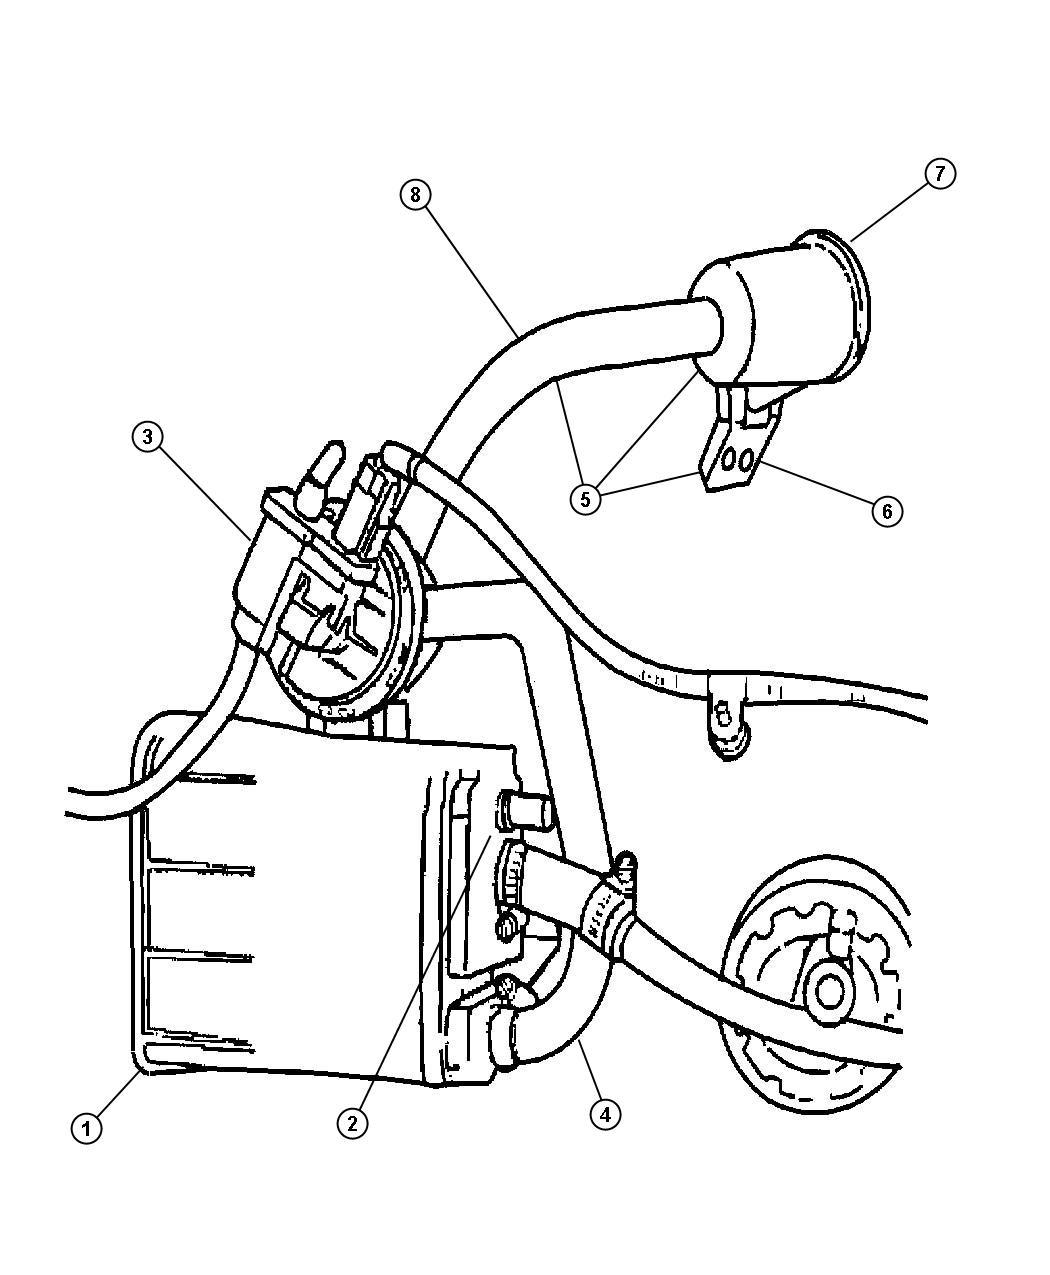 Stratus Vacuum Canister And Leak Detection Pump